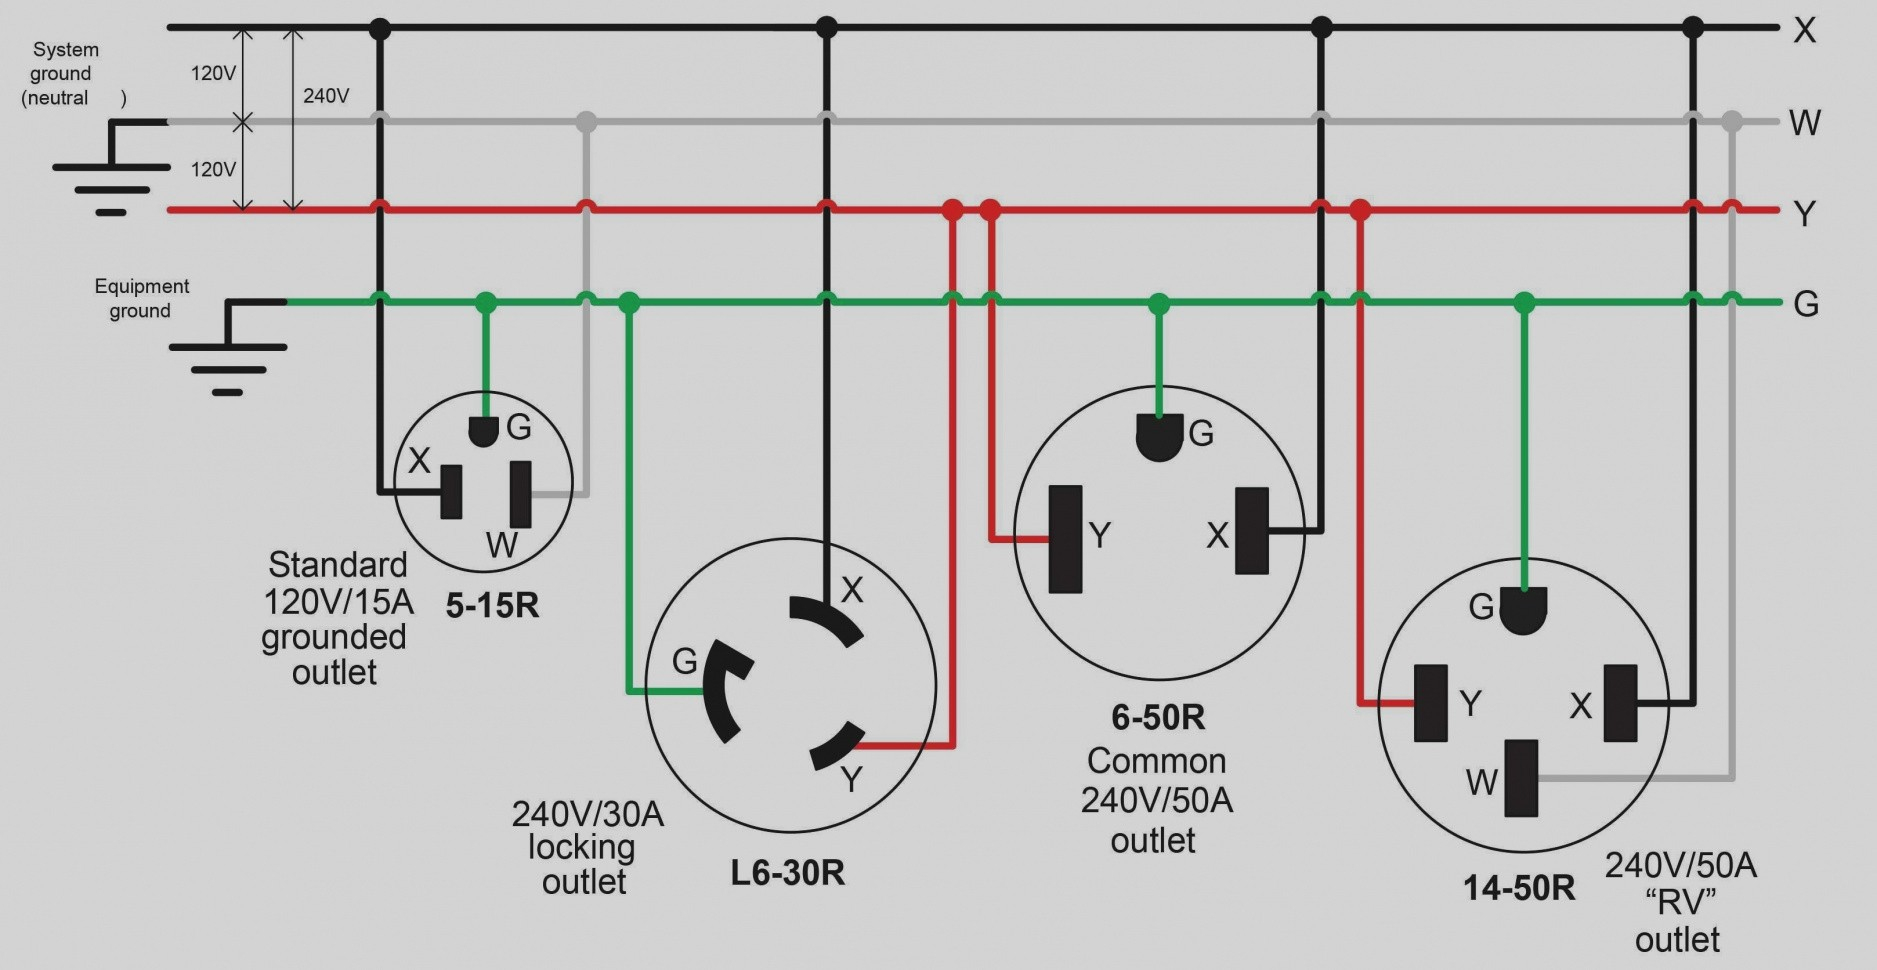 30 Amp Rv Plug Wiring Diagram | Manual E-Books - 30 Amp Rv Plug Wiring Diagram